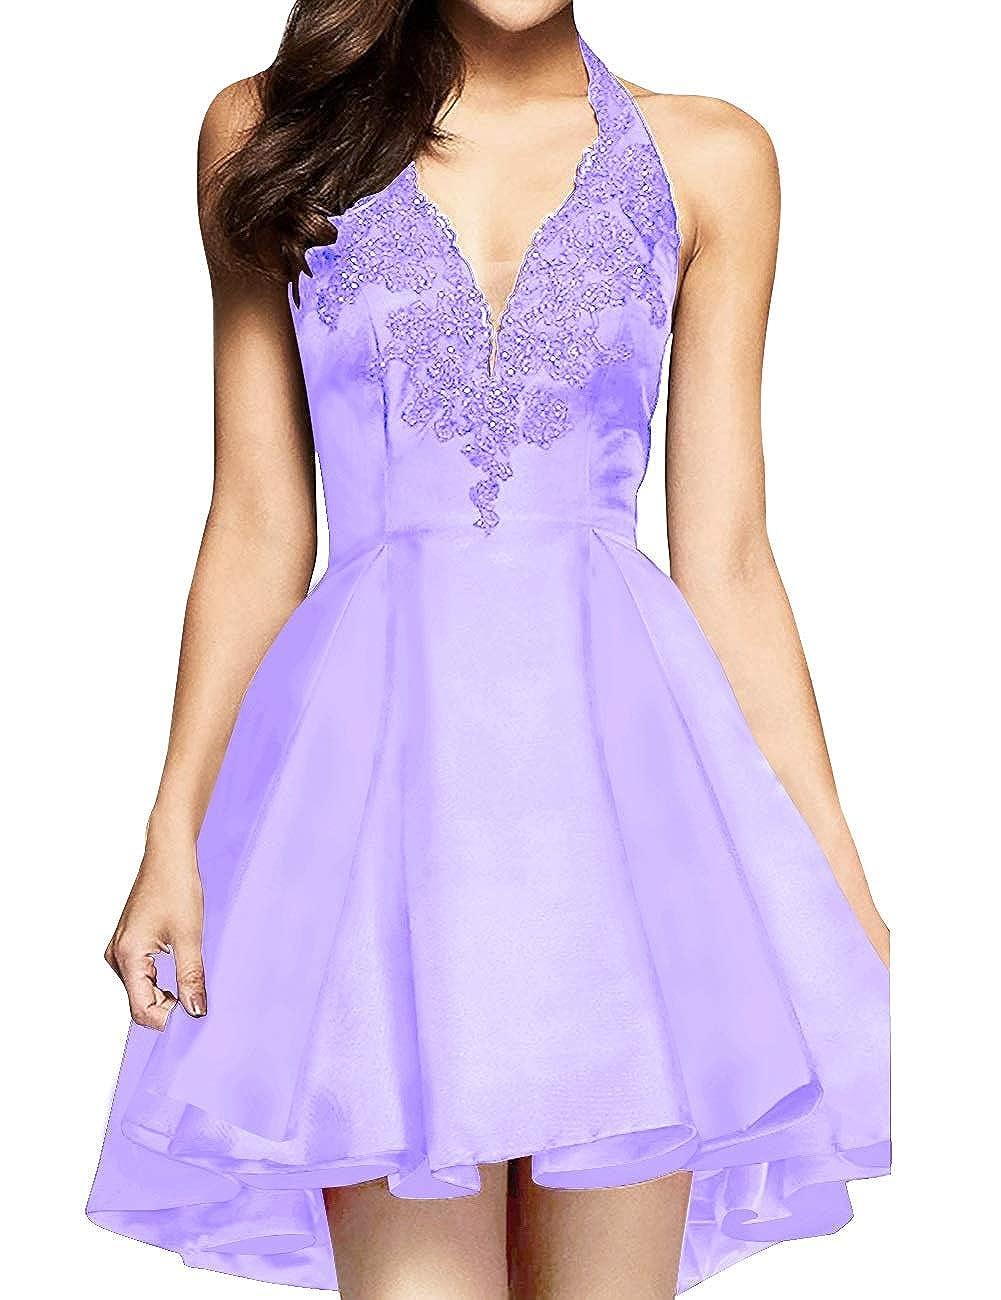 purplec MorySong Women's Applique Lace Satin Halter Neck Short Homecoming Cocktail Dress